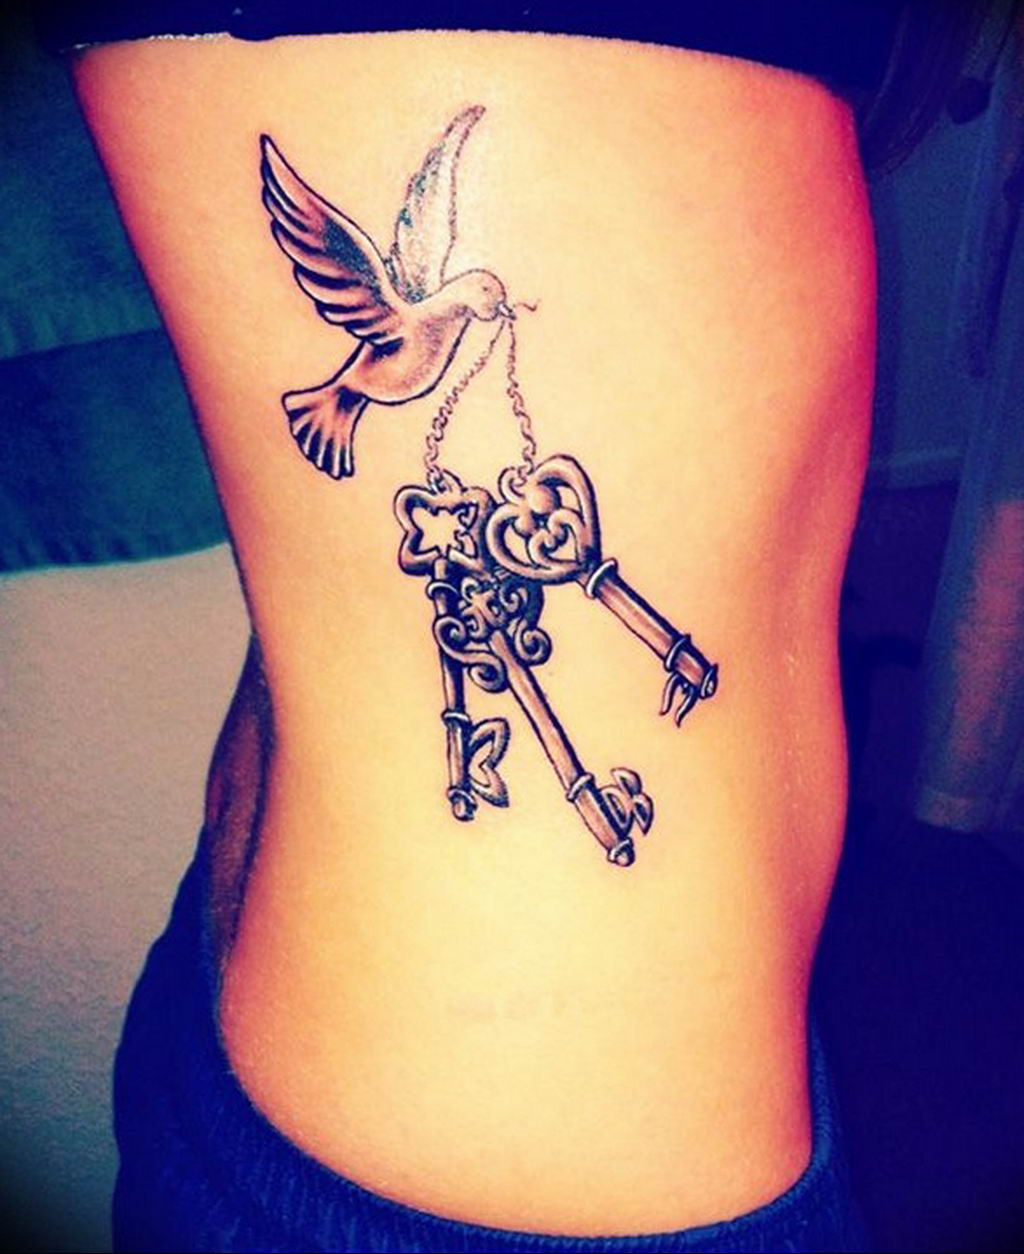 Фото тату для девушек ключ 21.08.2019 №010 - tattoo for girls key - tatufoto.com